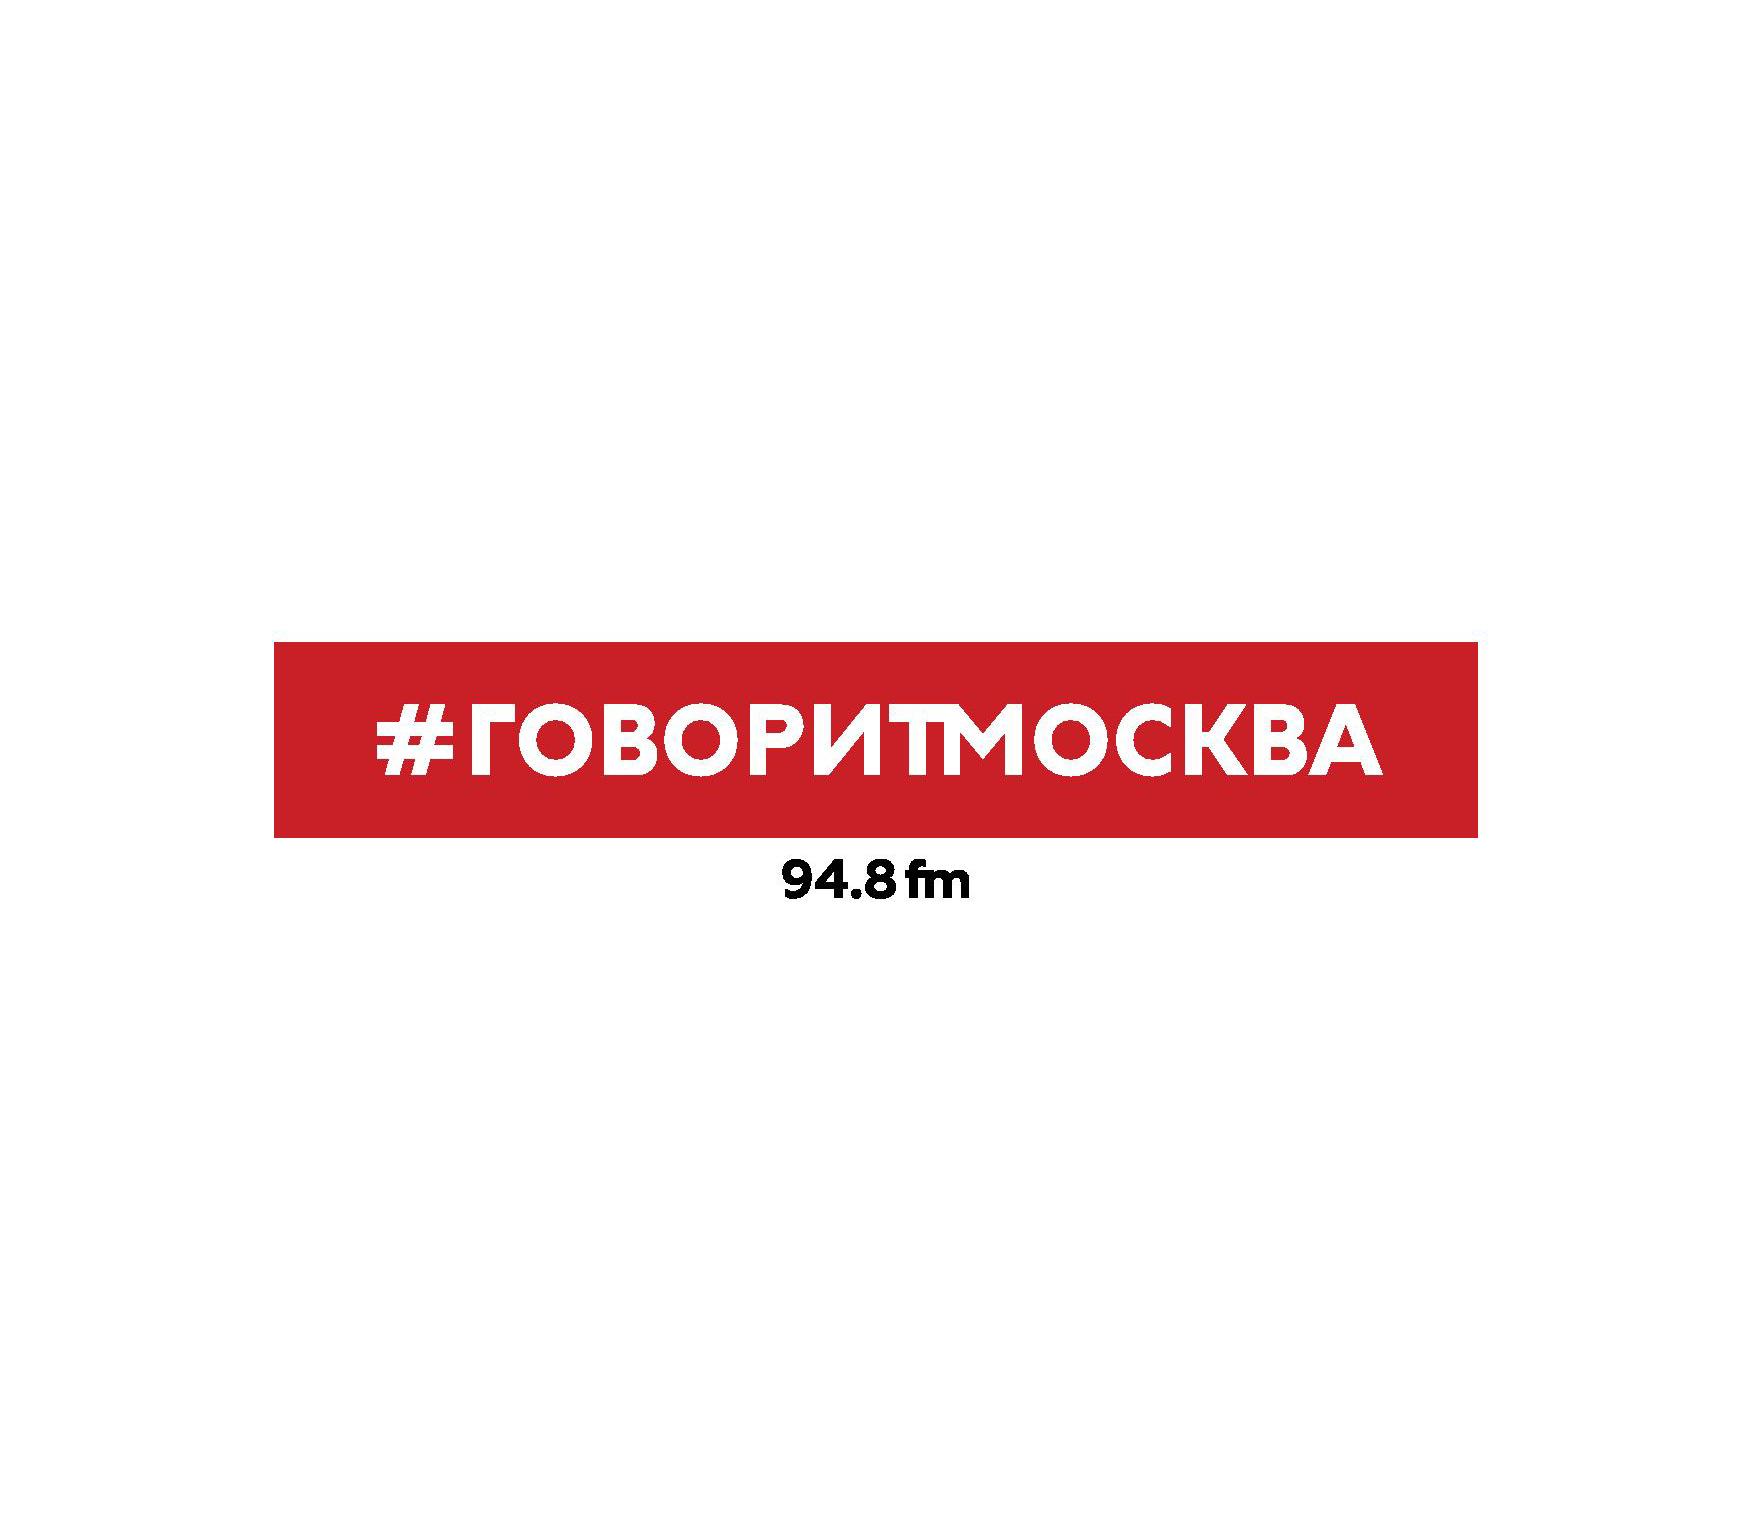 Макс Челноков 1 марта. Валентин Гефтер цена